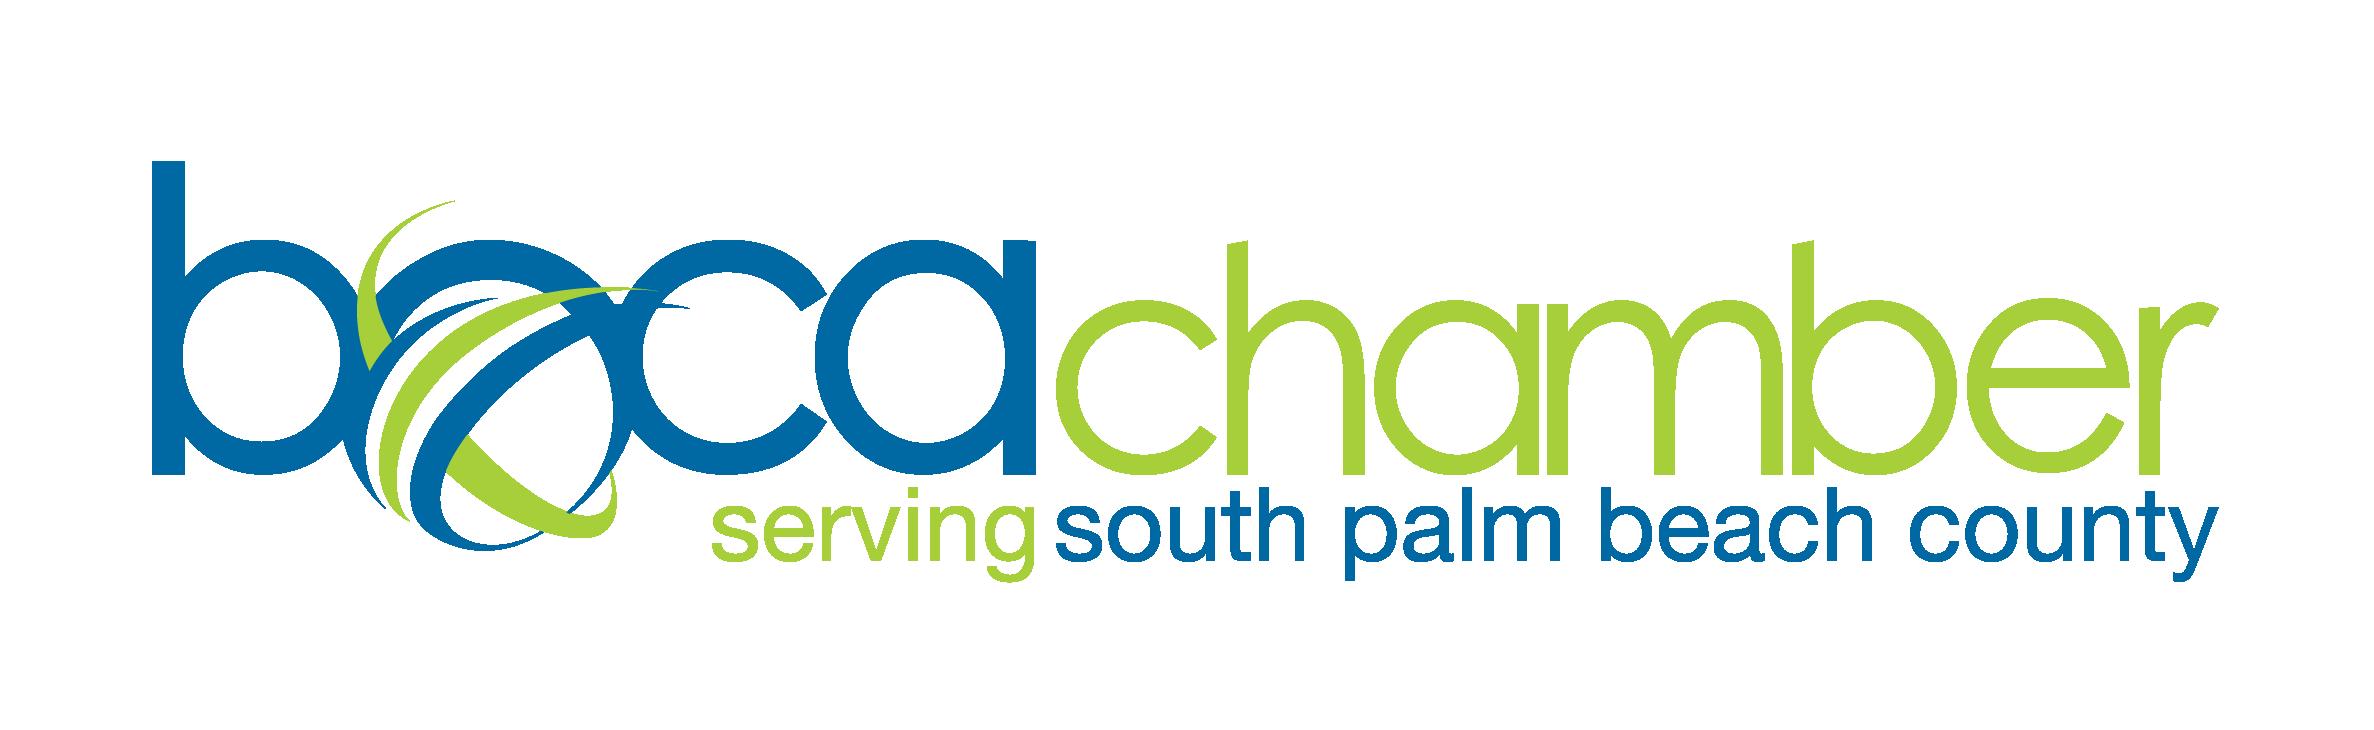 Boca Raton Chamber of Commerce